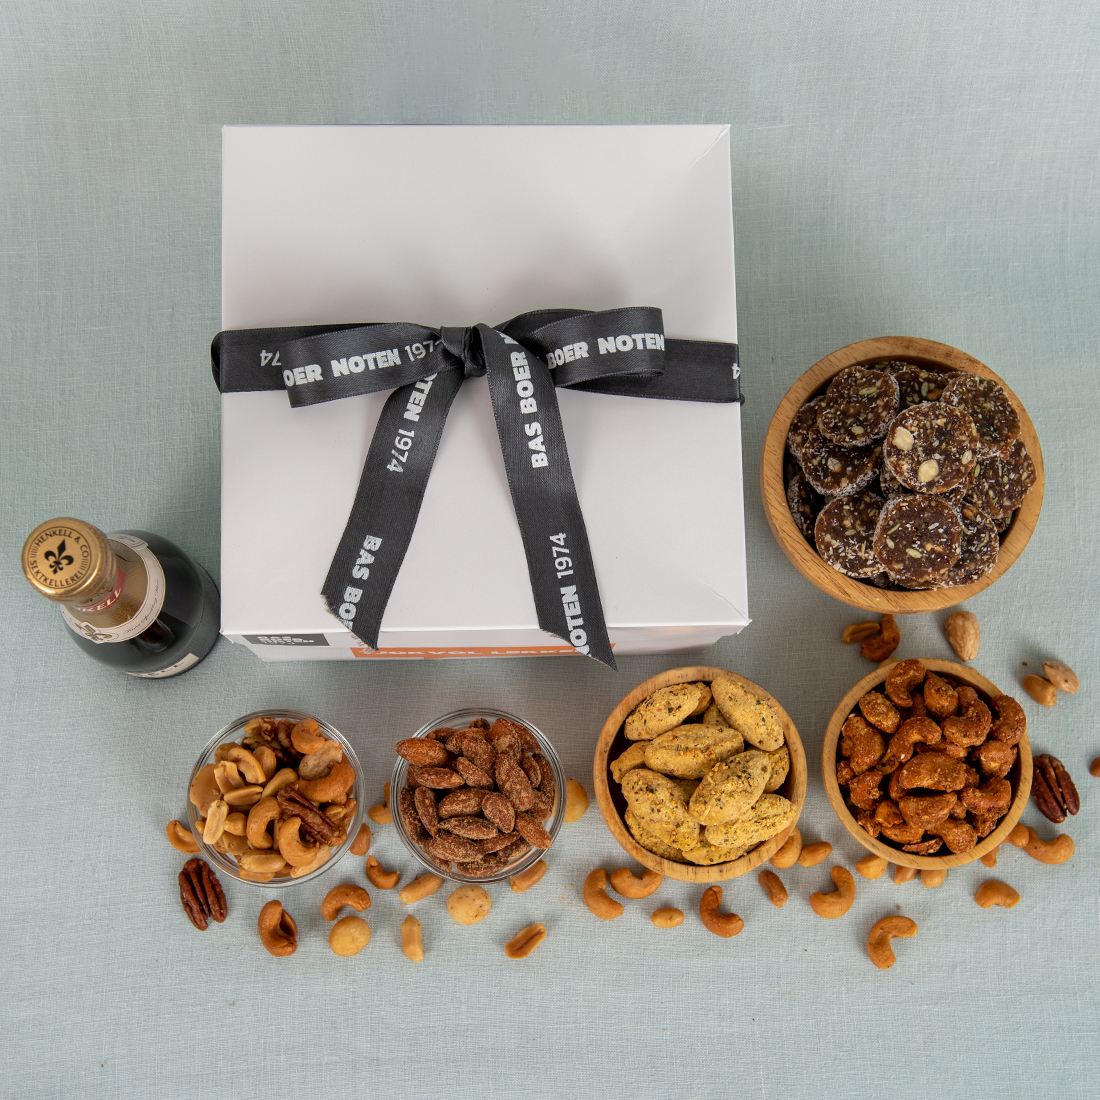 Borrelbox noten & bubbels